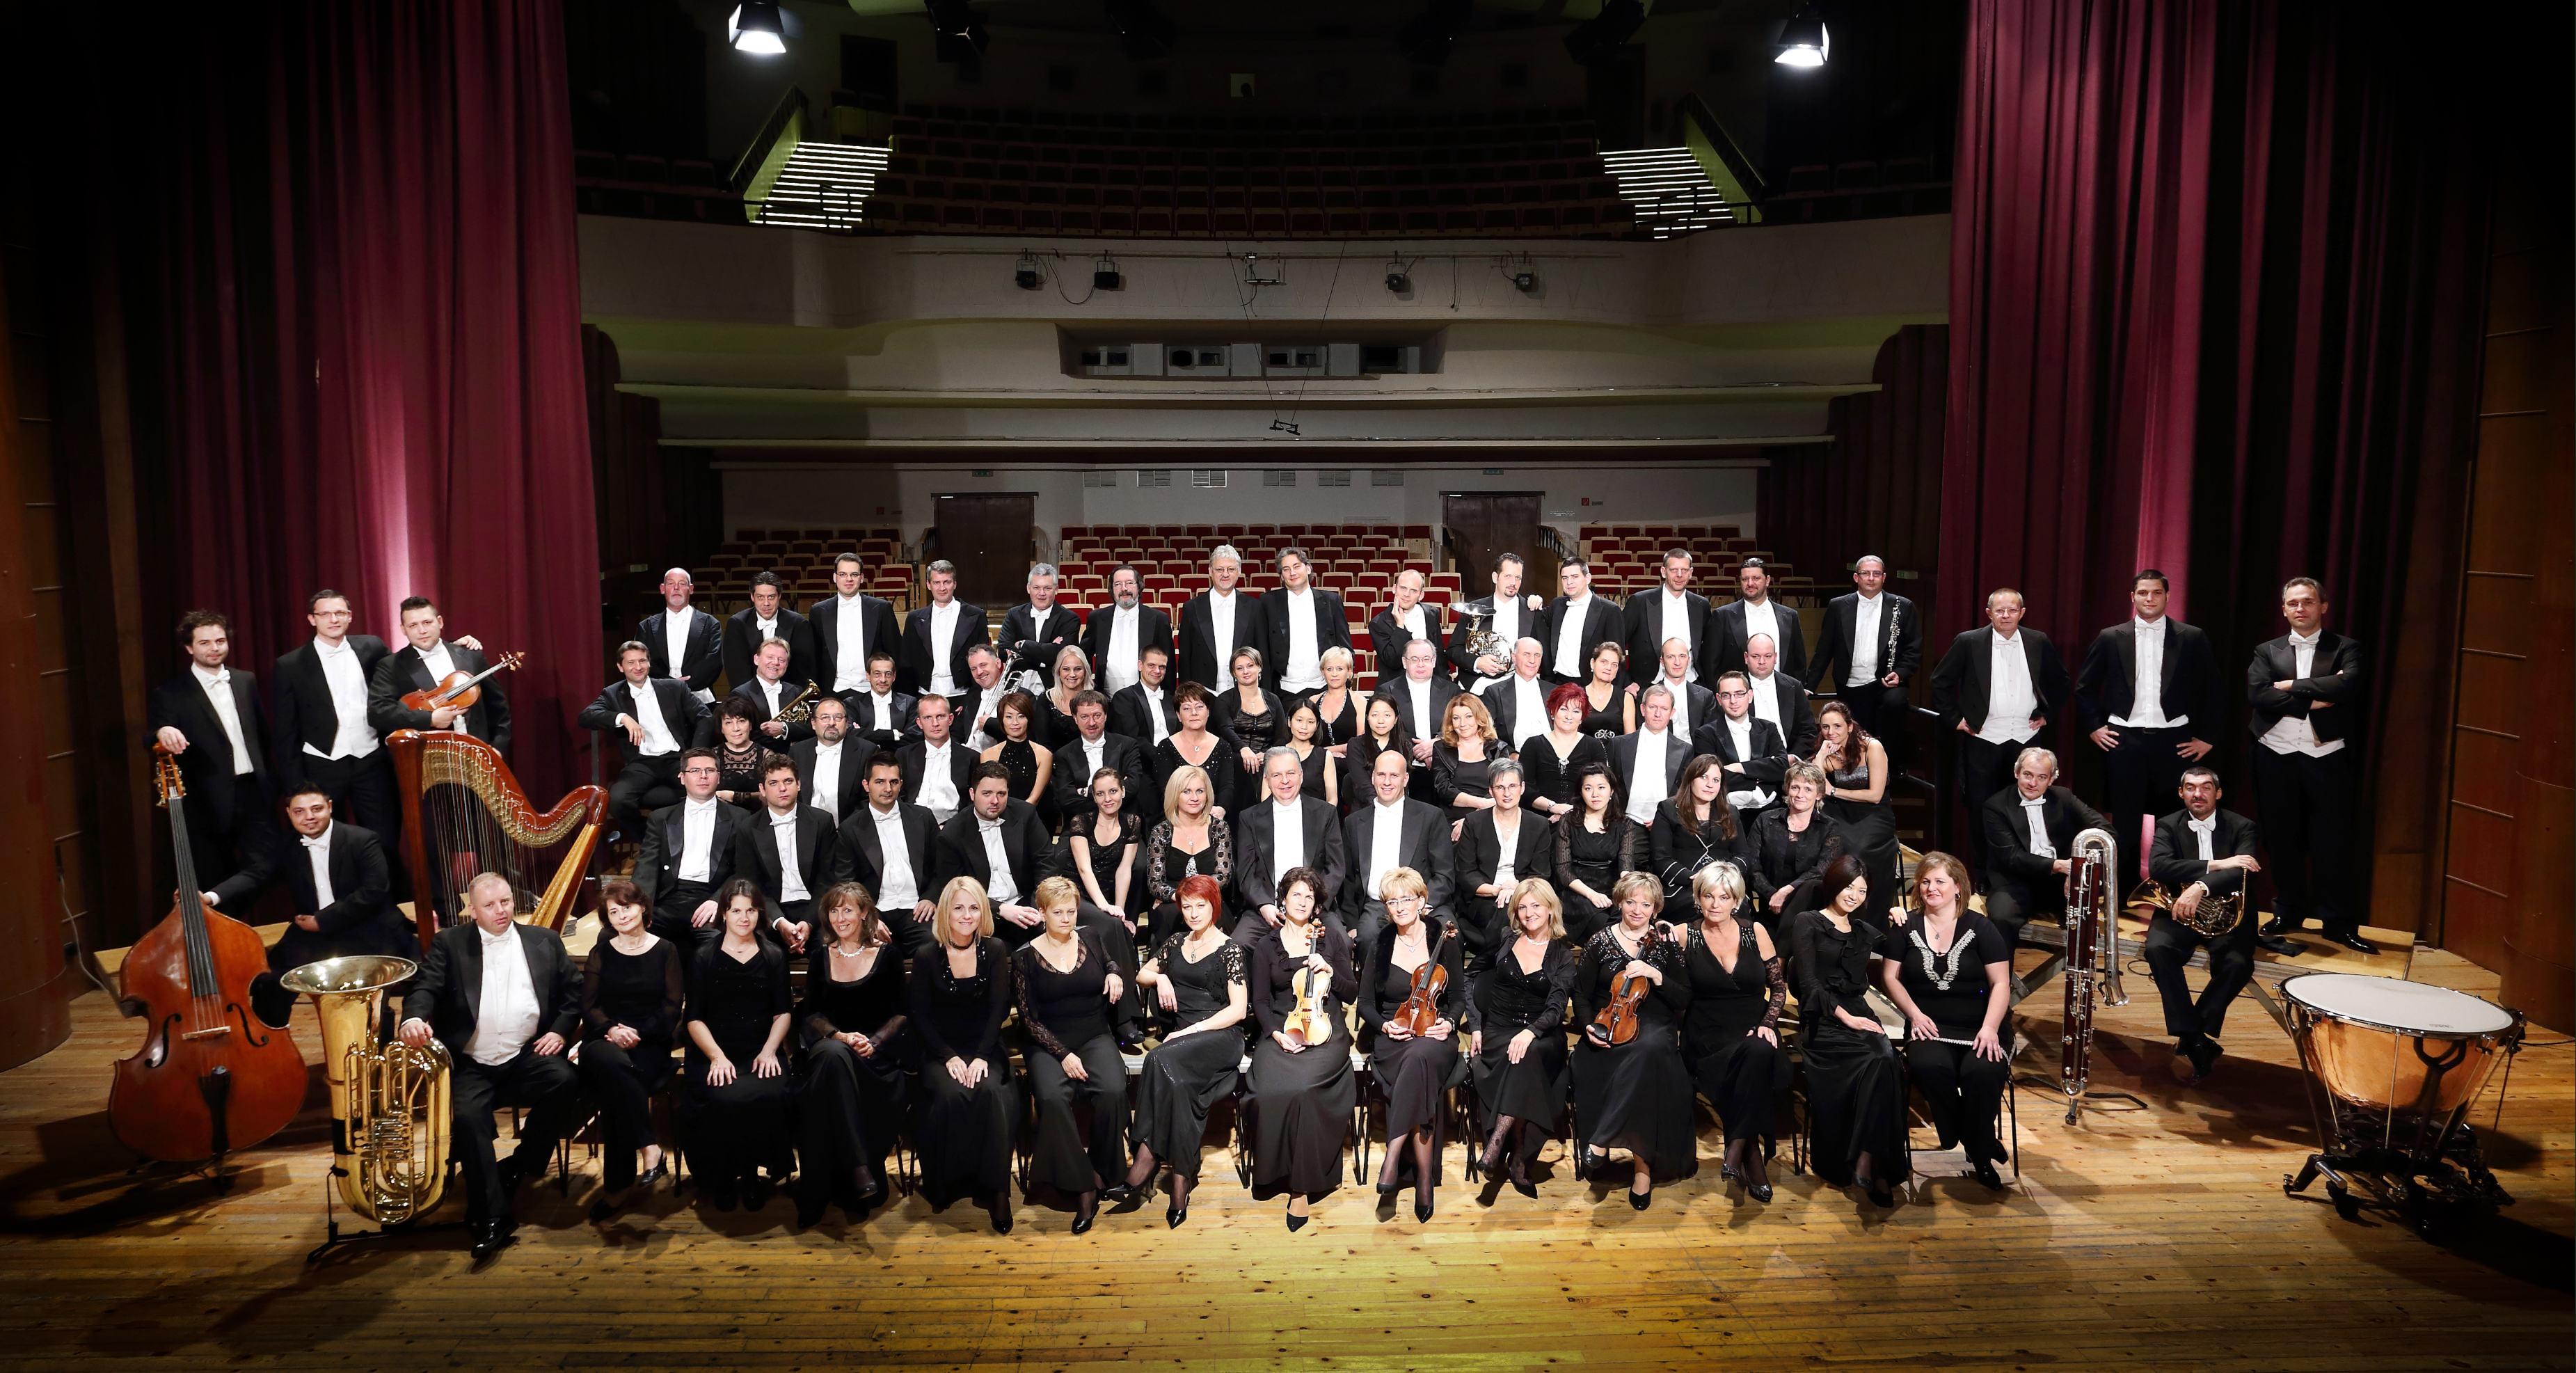 Gyori Filharmonikus Zenekar hivatalos fotó